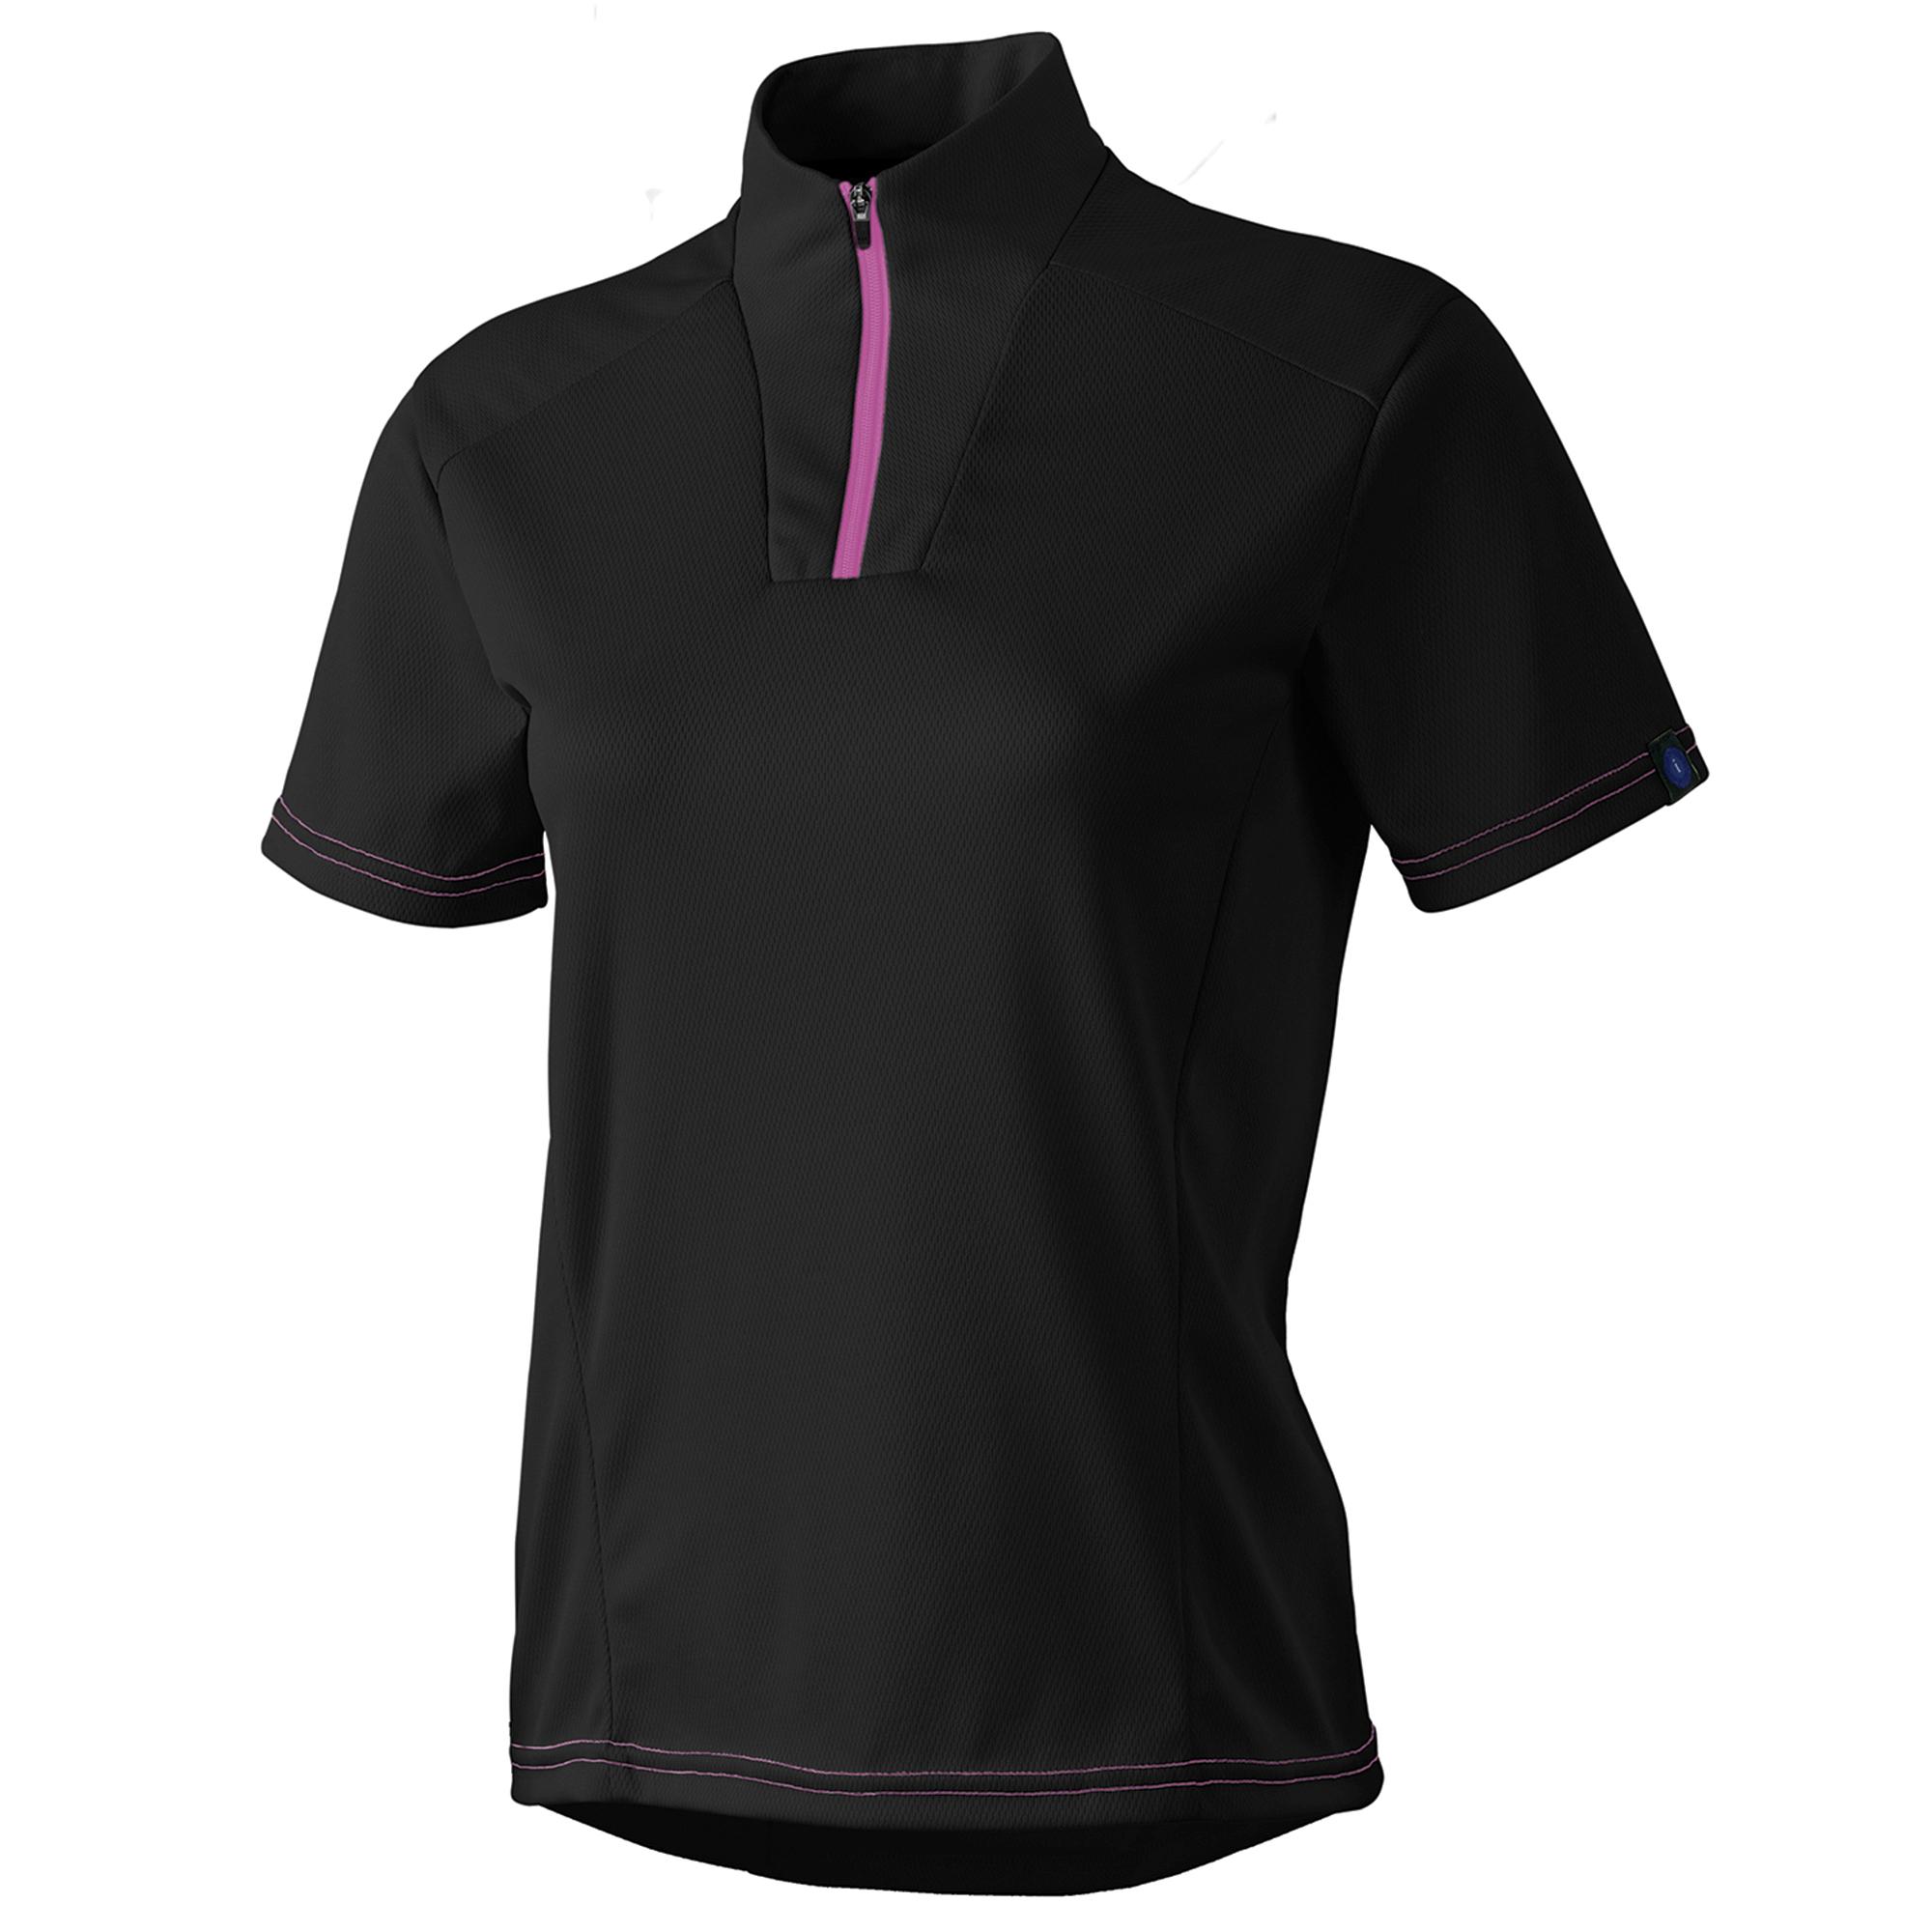 Irideon Radiance Parasol Short Sleeve Jersey - Ladies